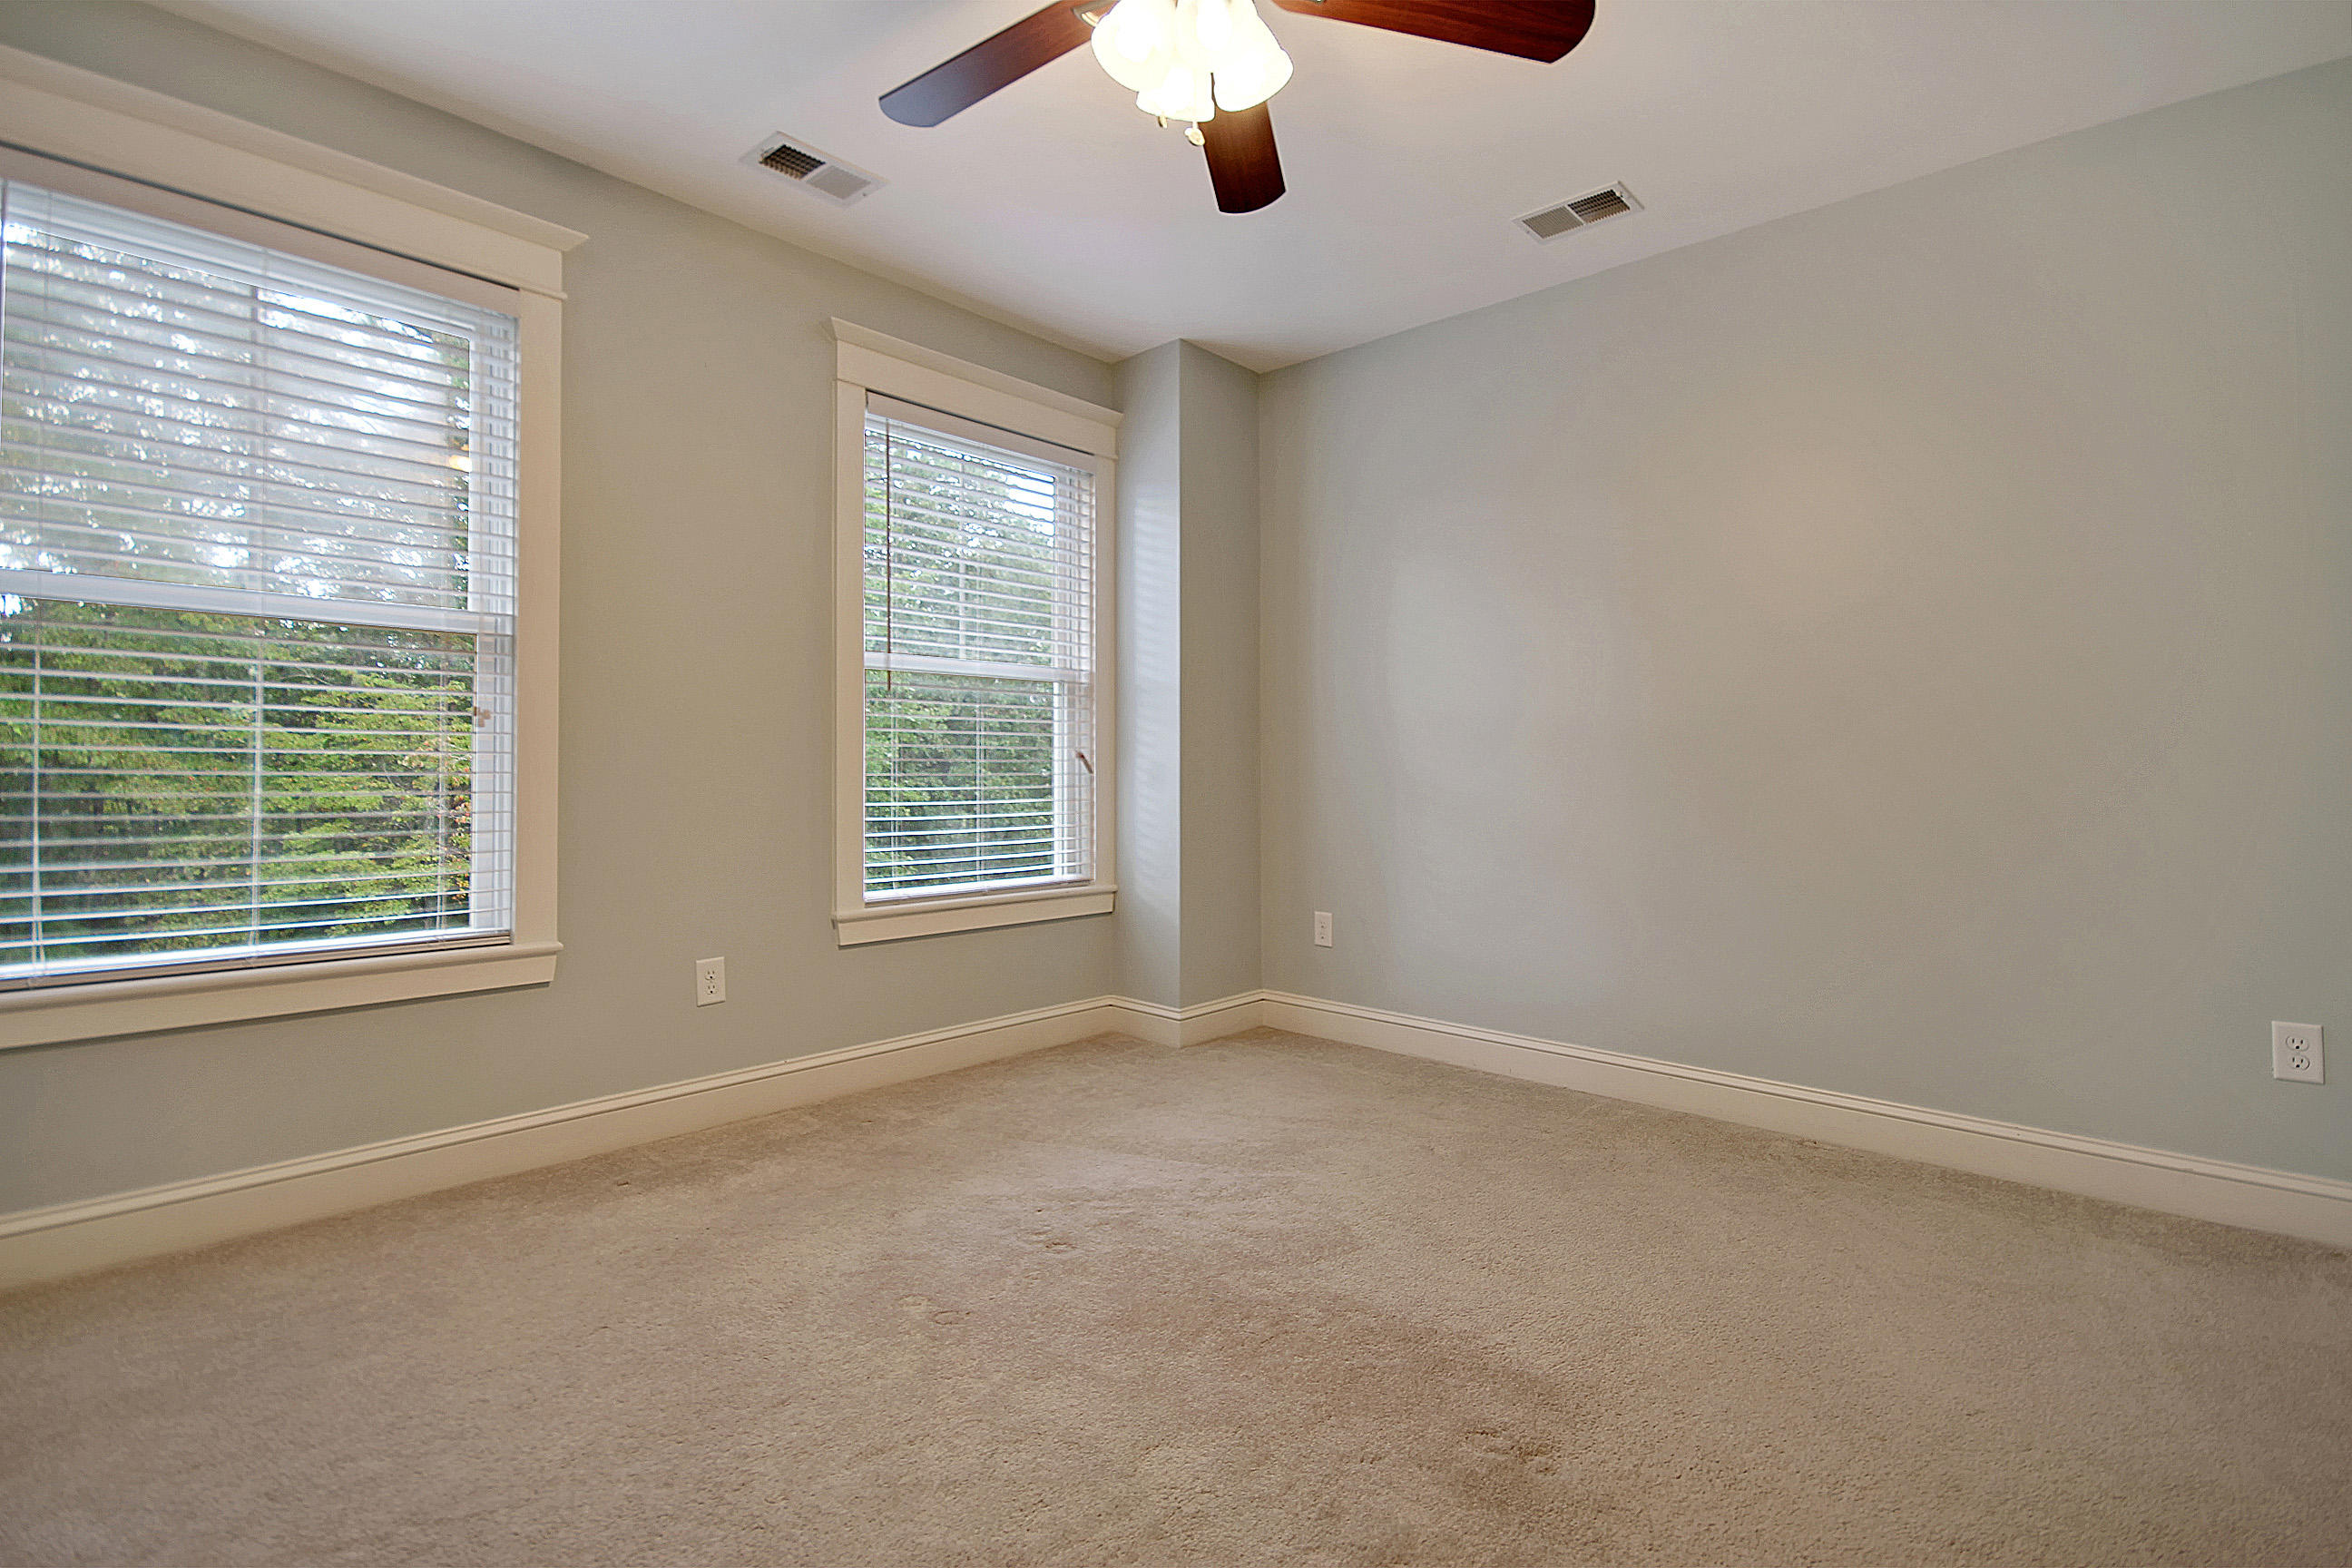 Home for sale 337 Broadleaf Drive, Autumn Creek, Berkeley Triangle, SC